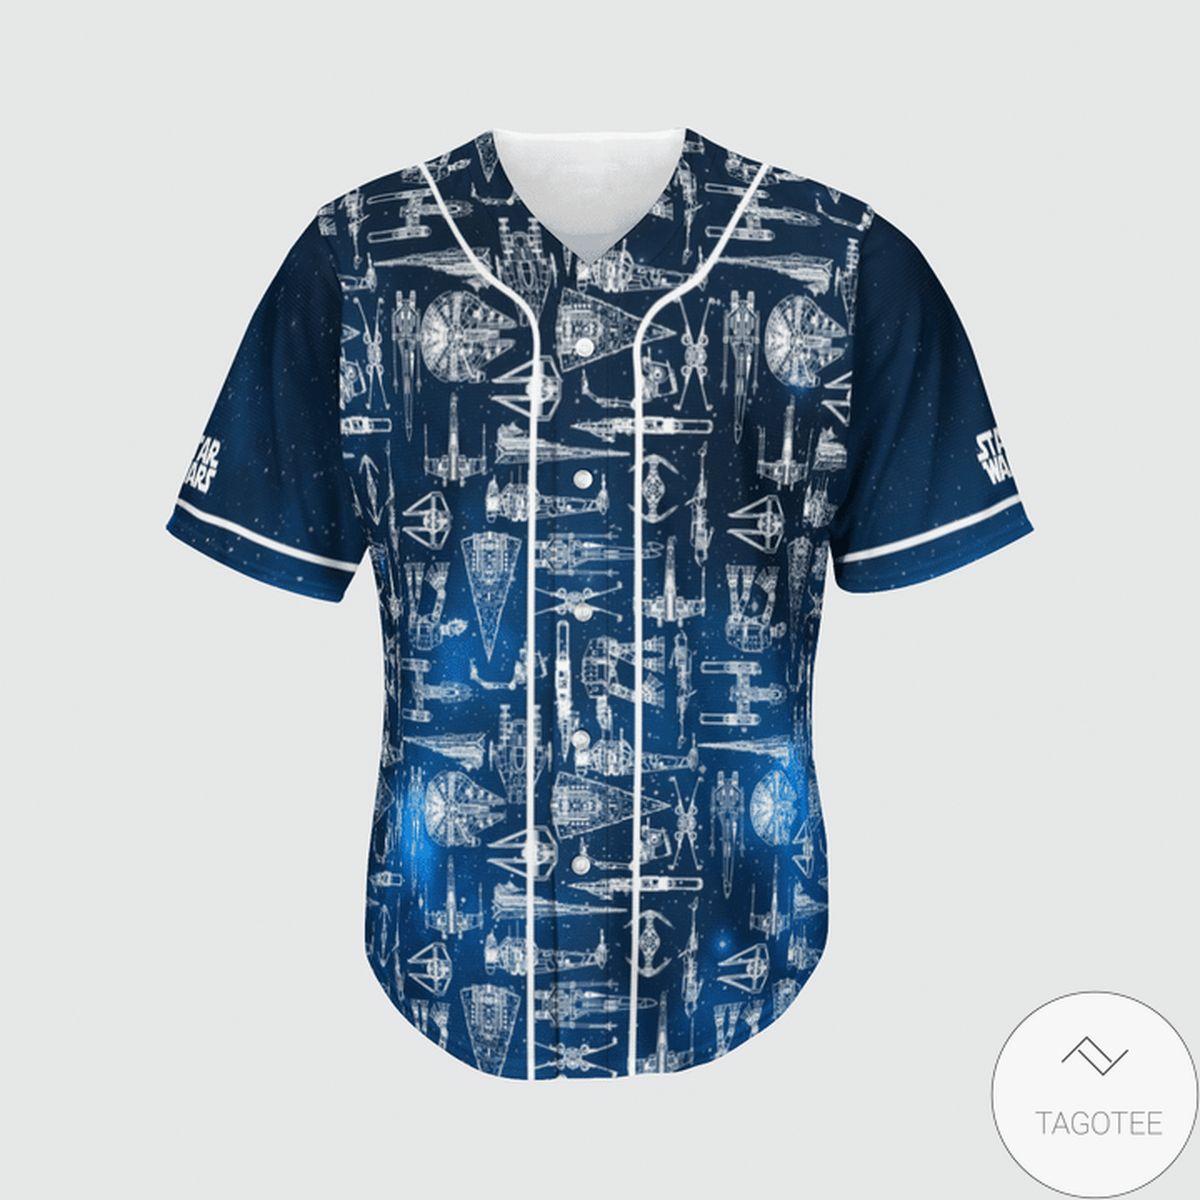 Esty Star Wars Spaceship Blueprint Baseball Jersey